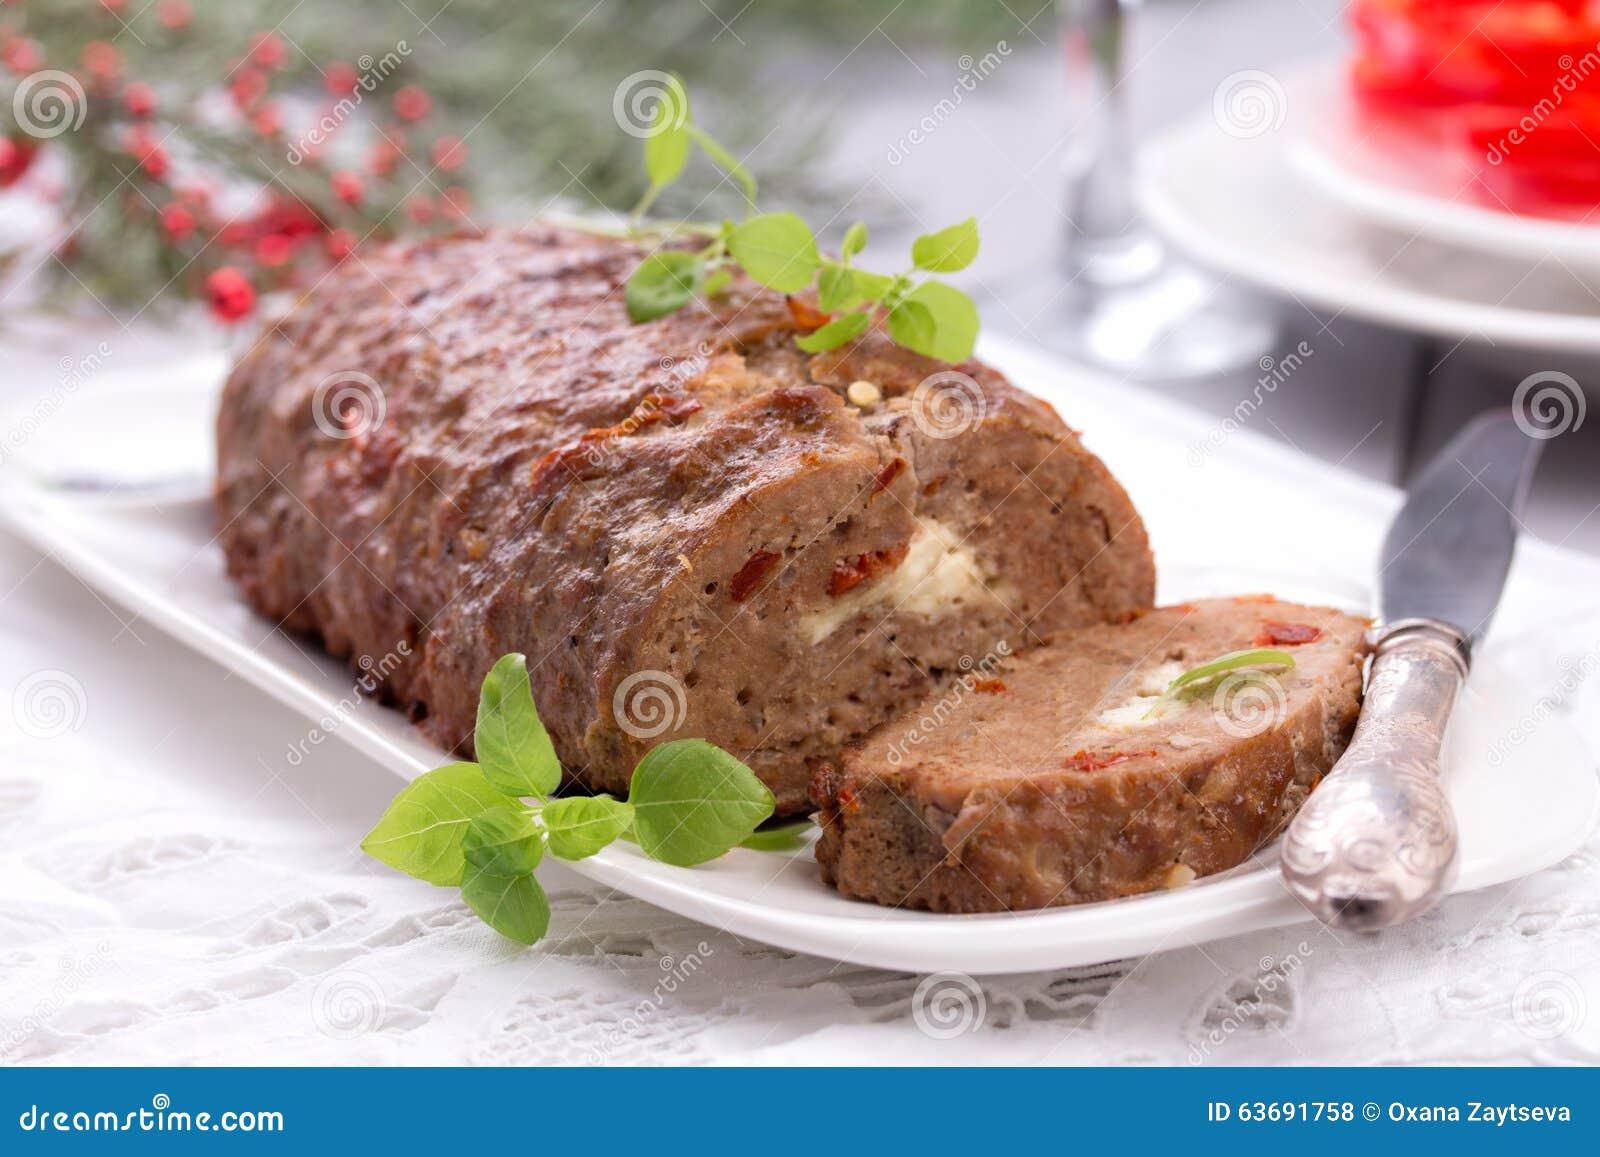 Sliced Homemade Meatloaf Stock Photo Image 63691758